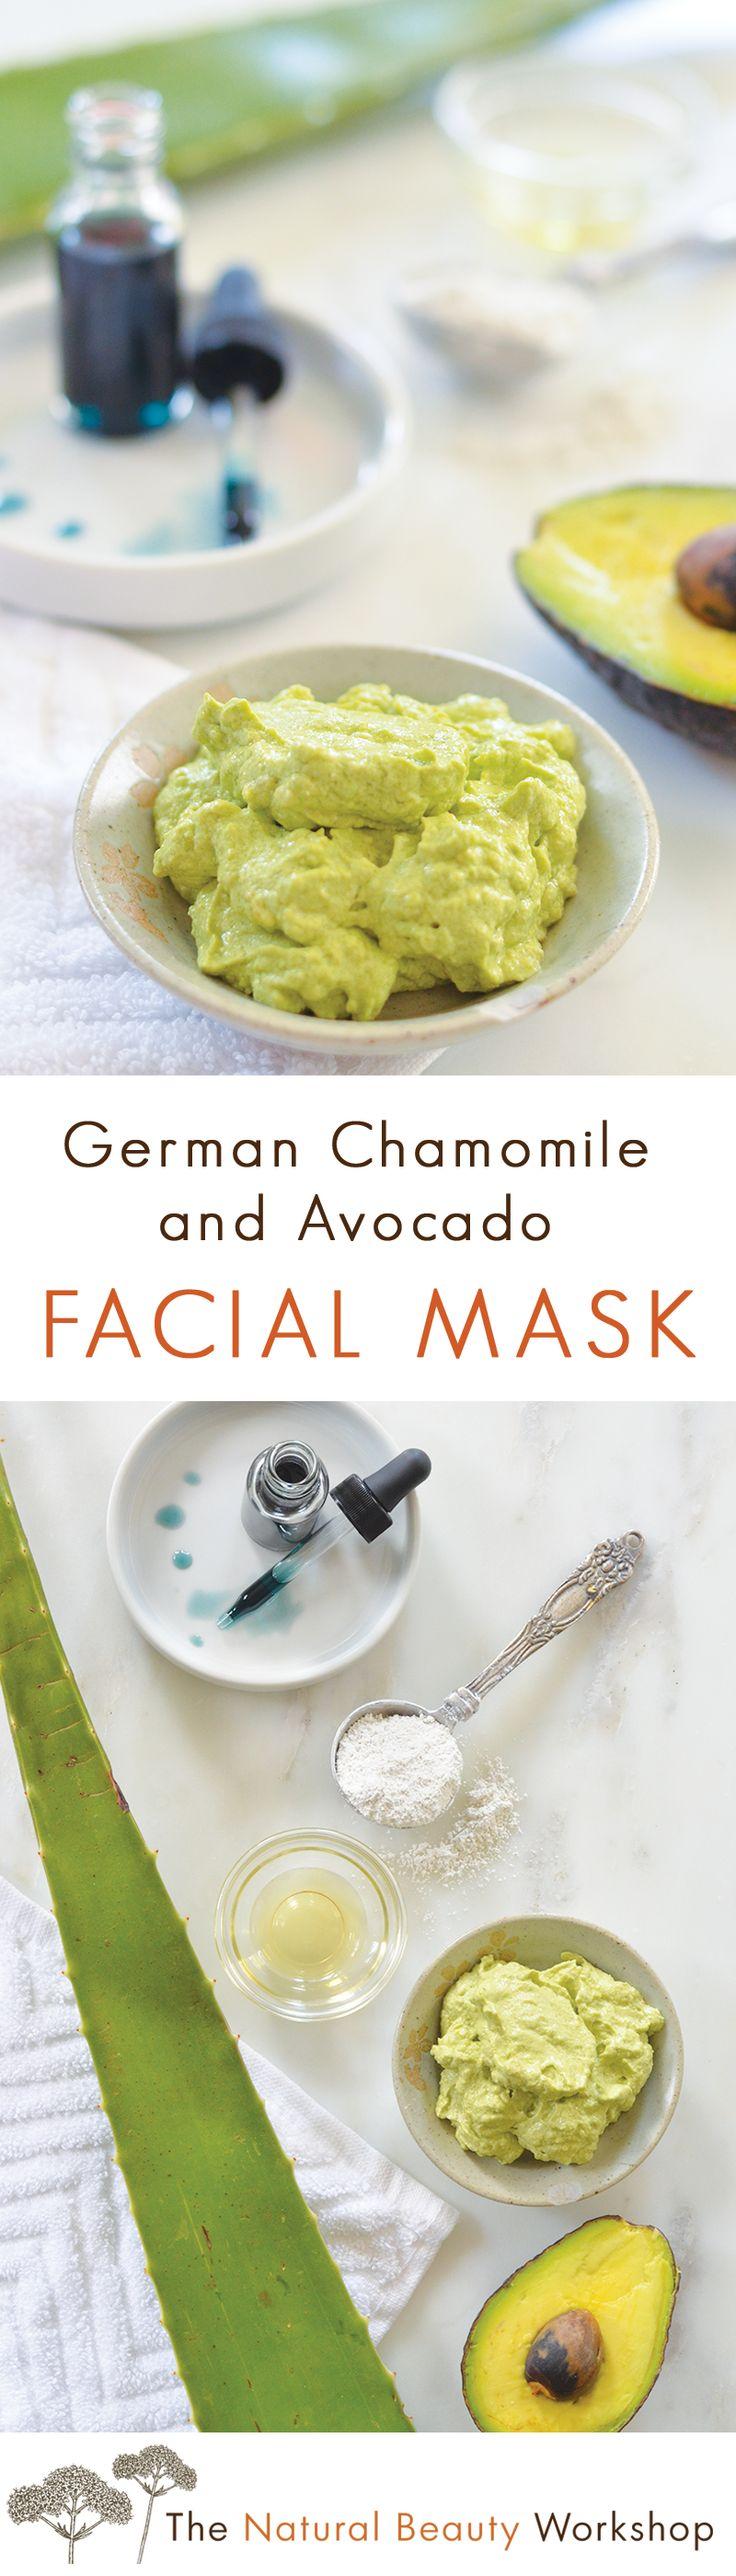 German Chamomile and Avocado Facial Mask Recipe